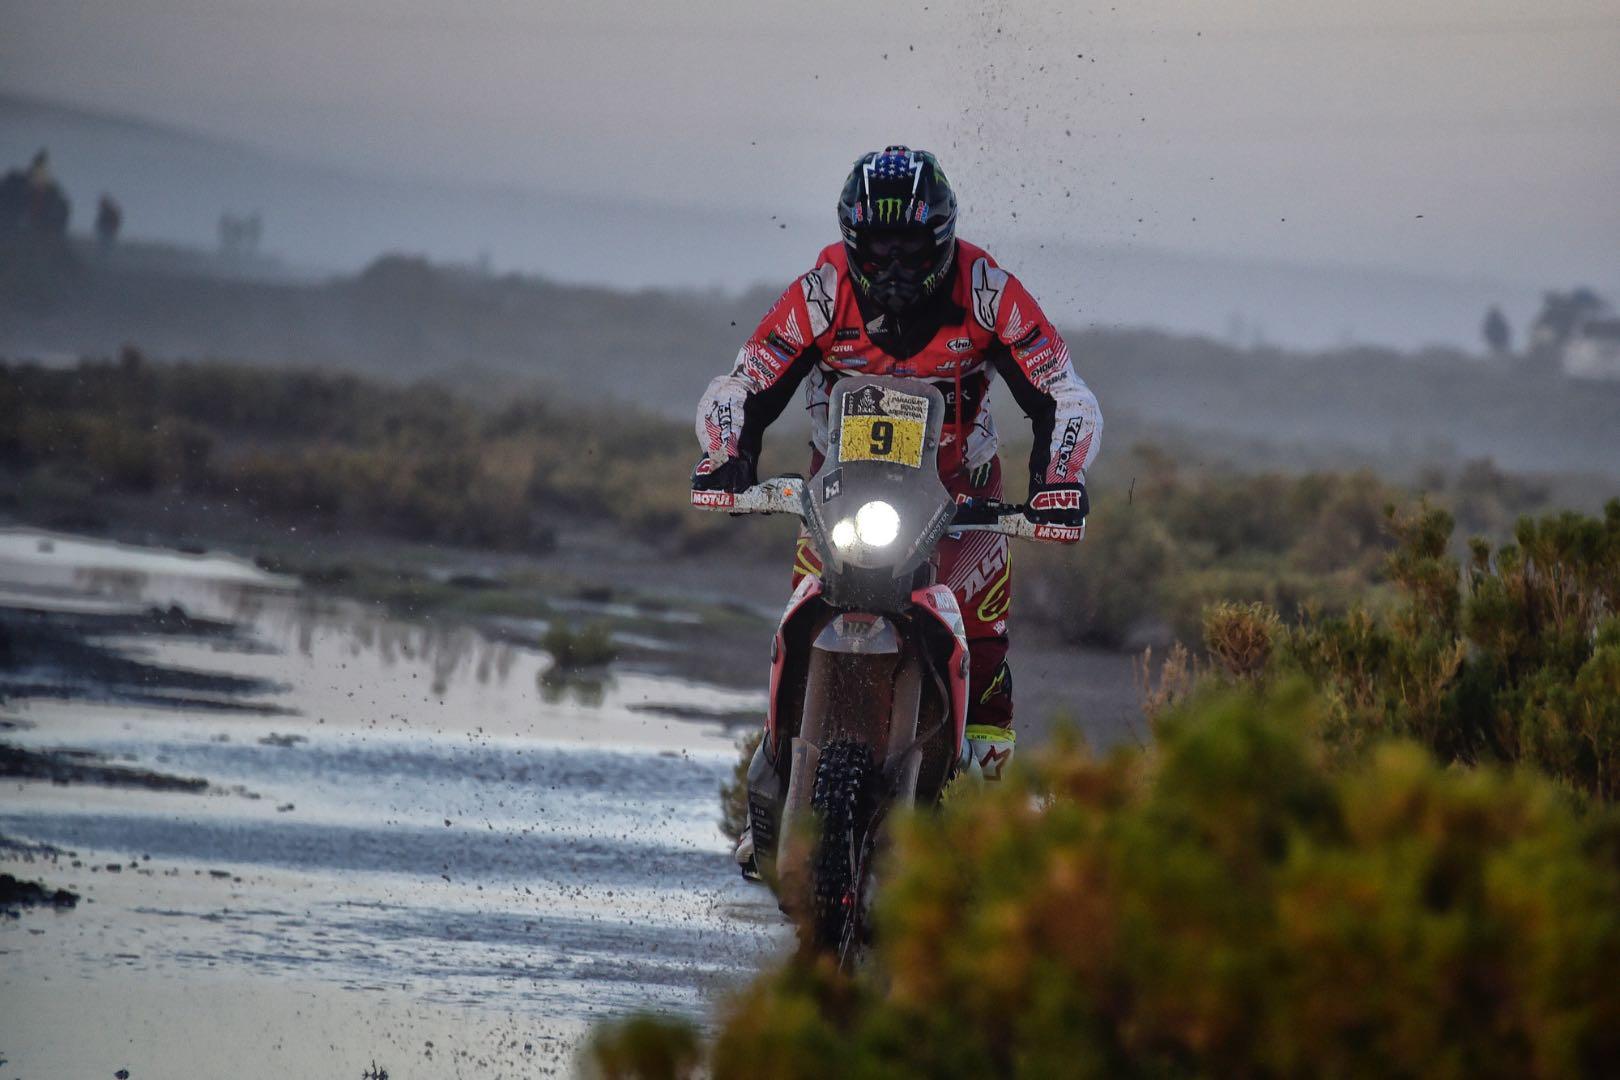 2017 Dakar Rally Motorcycles stage 8 results, Ricky Brabec